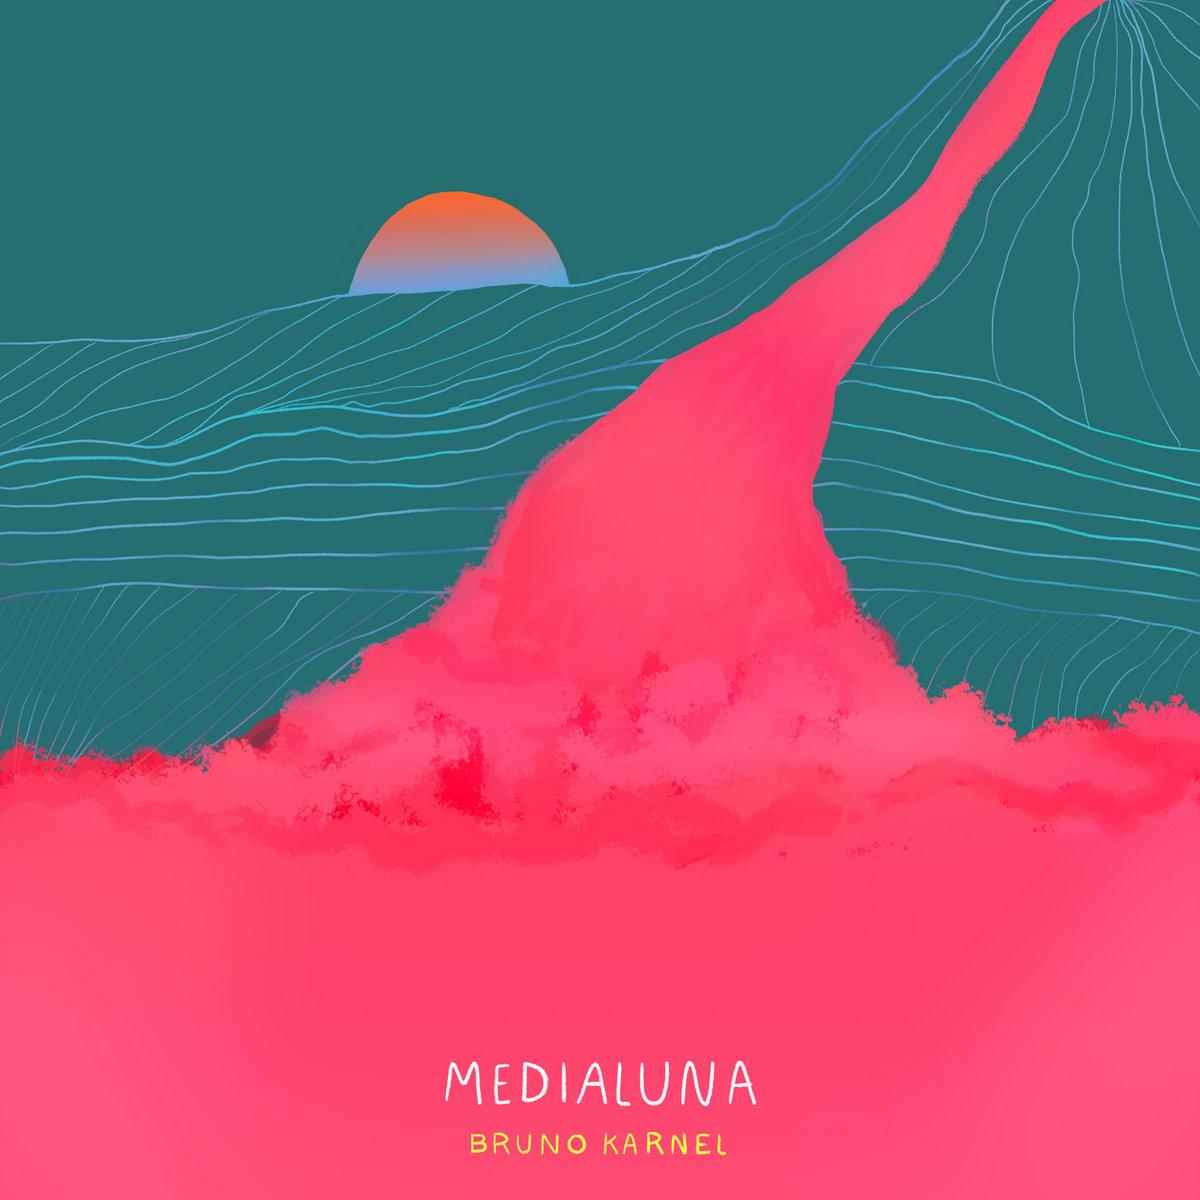 Medialuna (single)